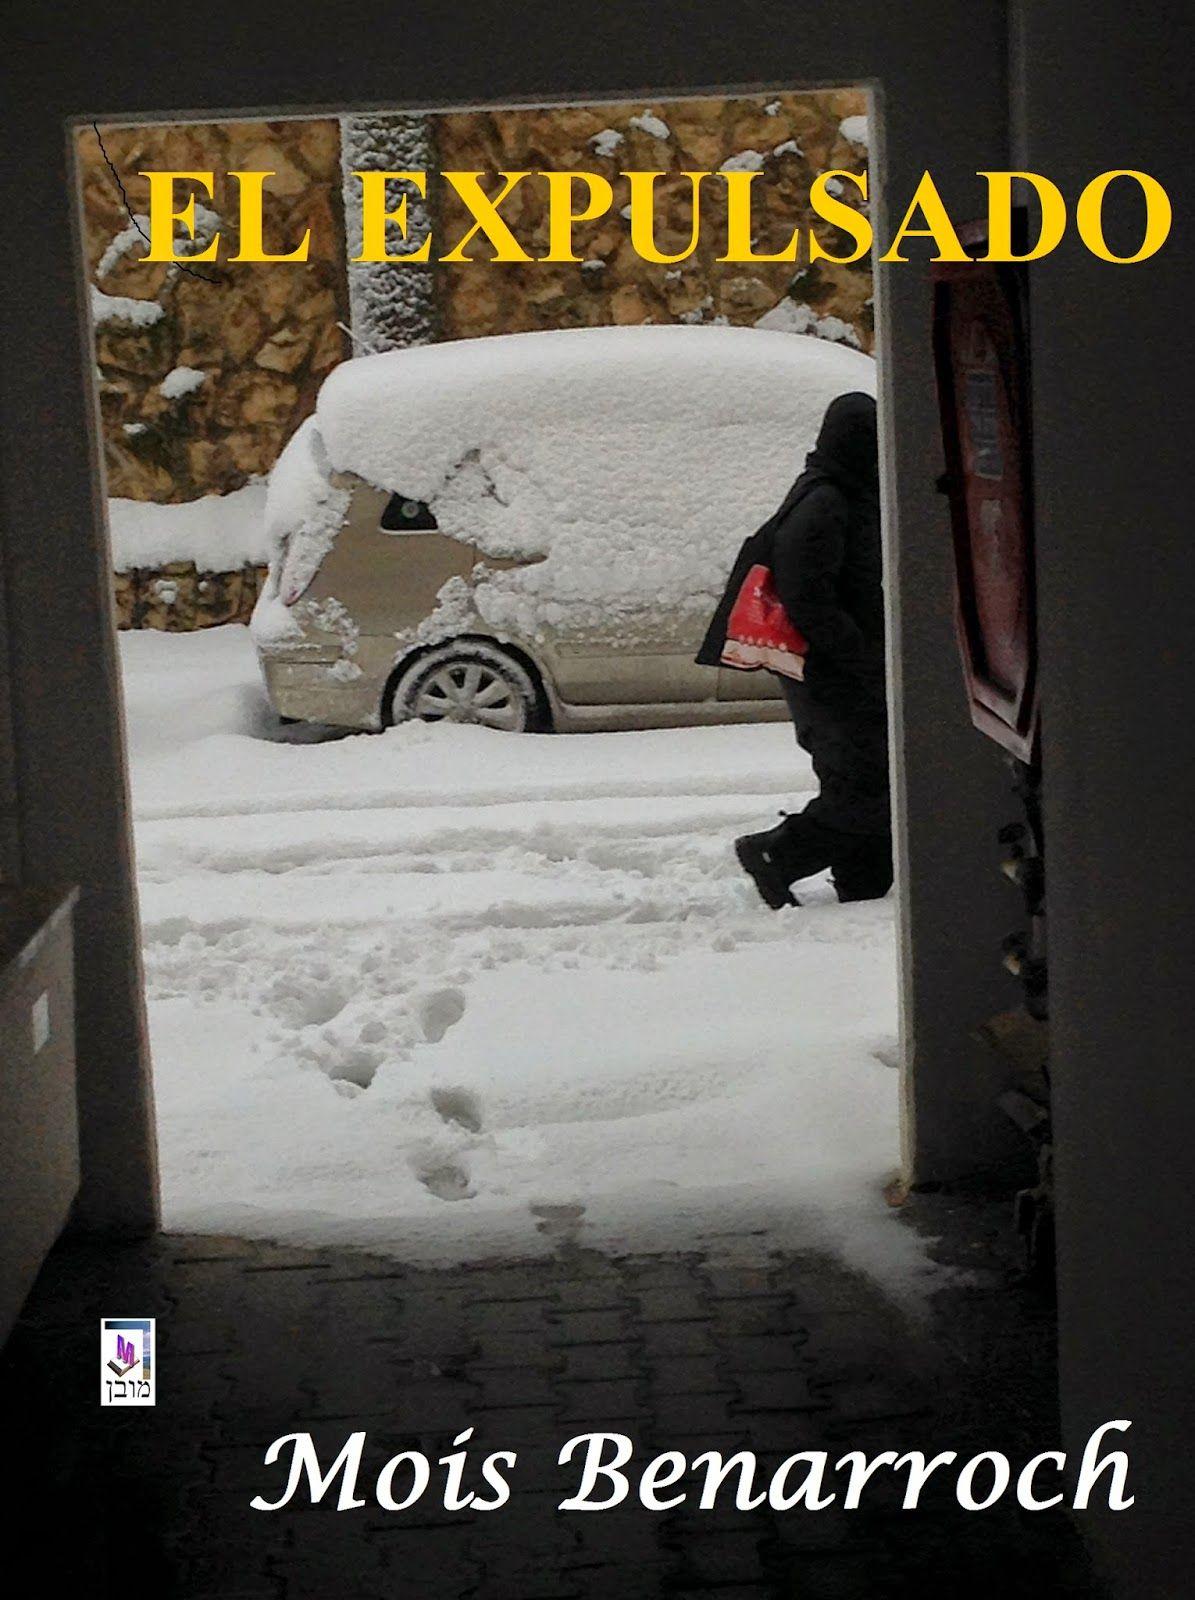 Mois Benarroch- el blog en castellano: EL EXPULSADO - NOVELA DE Mois Benarroch